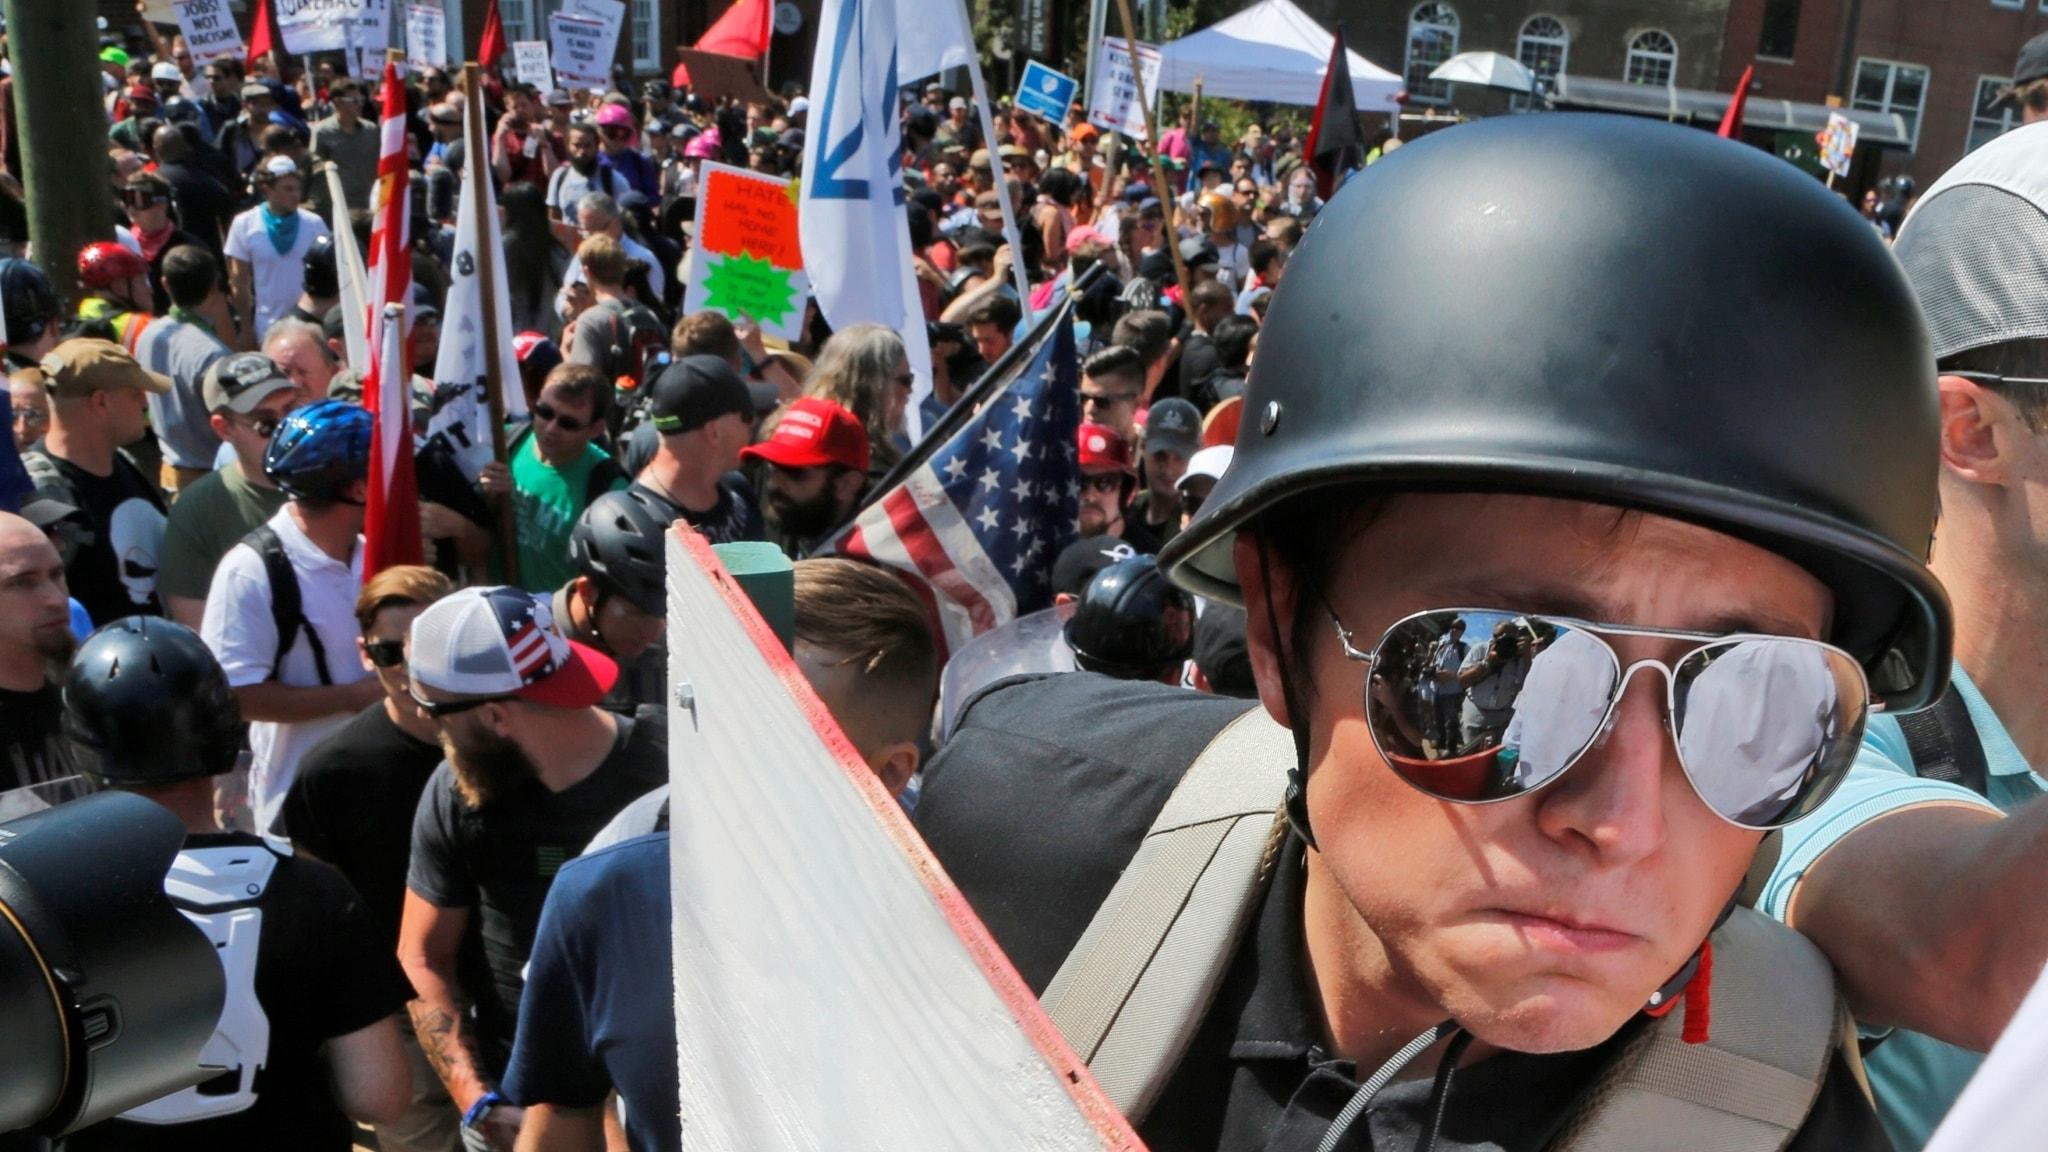 Vit-maktdemonstration i Charlottesville, USA